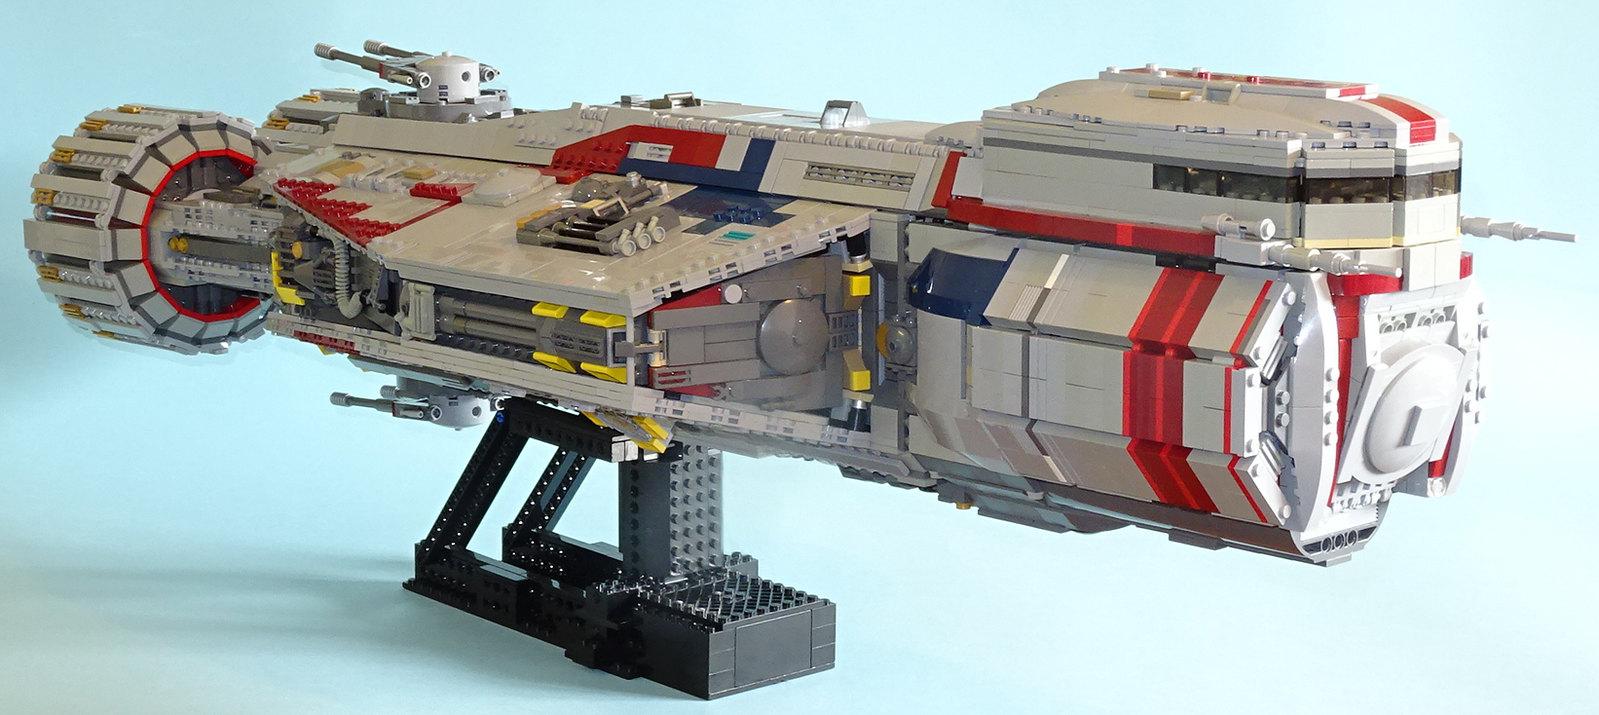 lego star wars yellow ship instructions